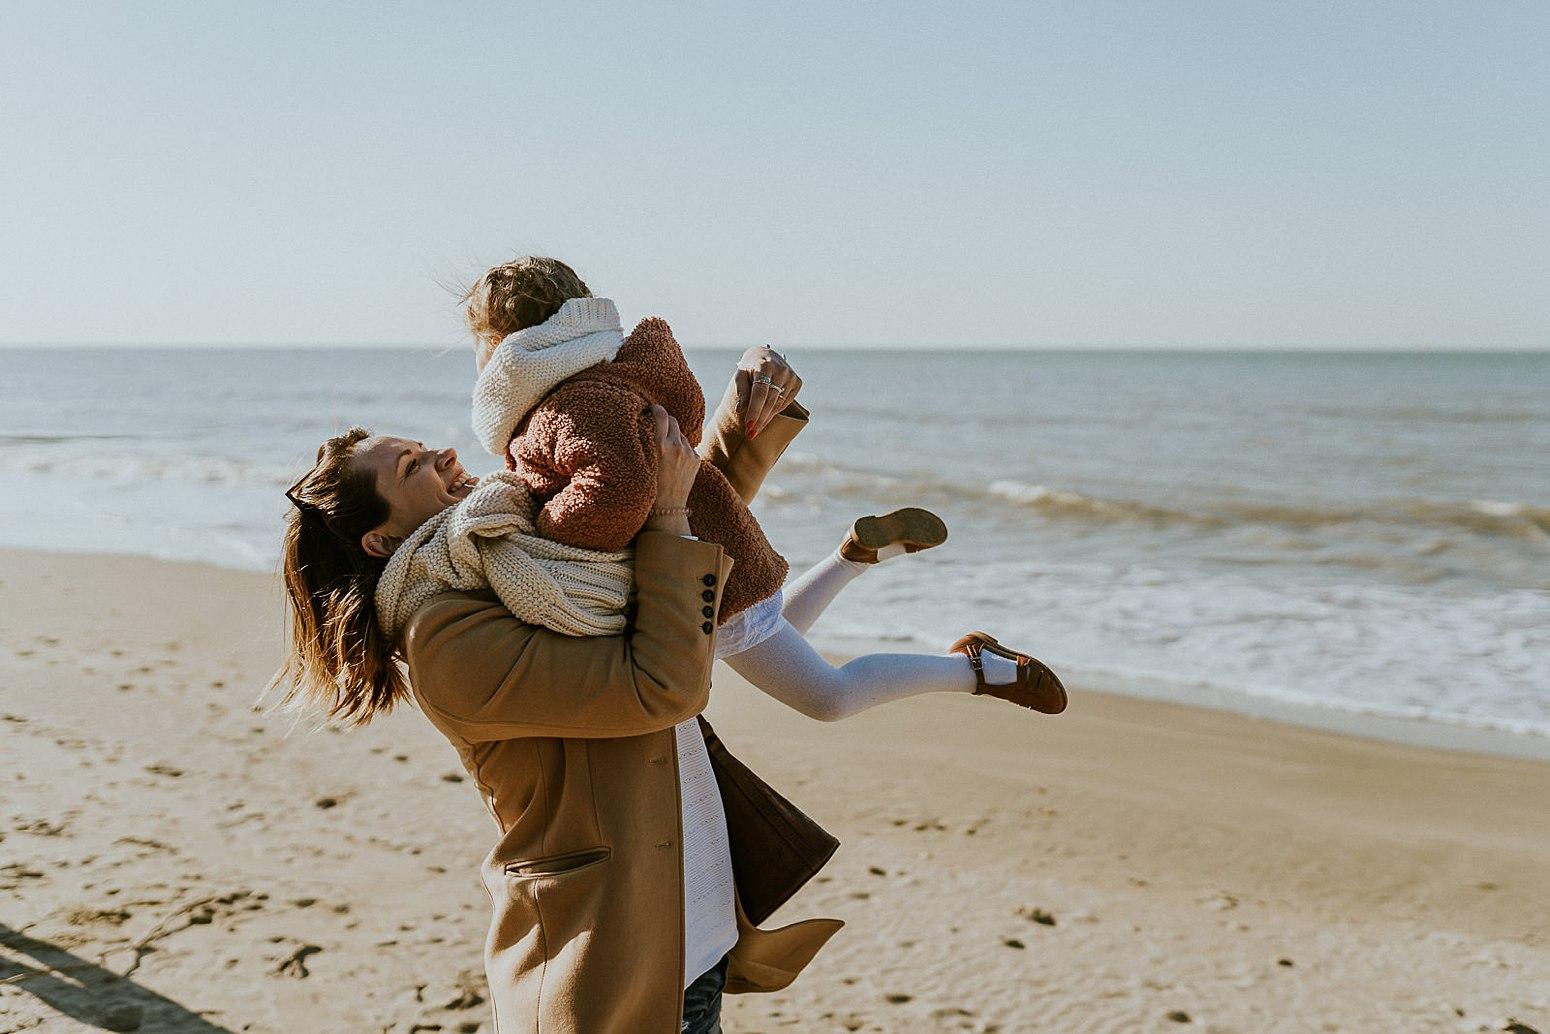 photographe-famille-normandie-plage_0026.jpg